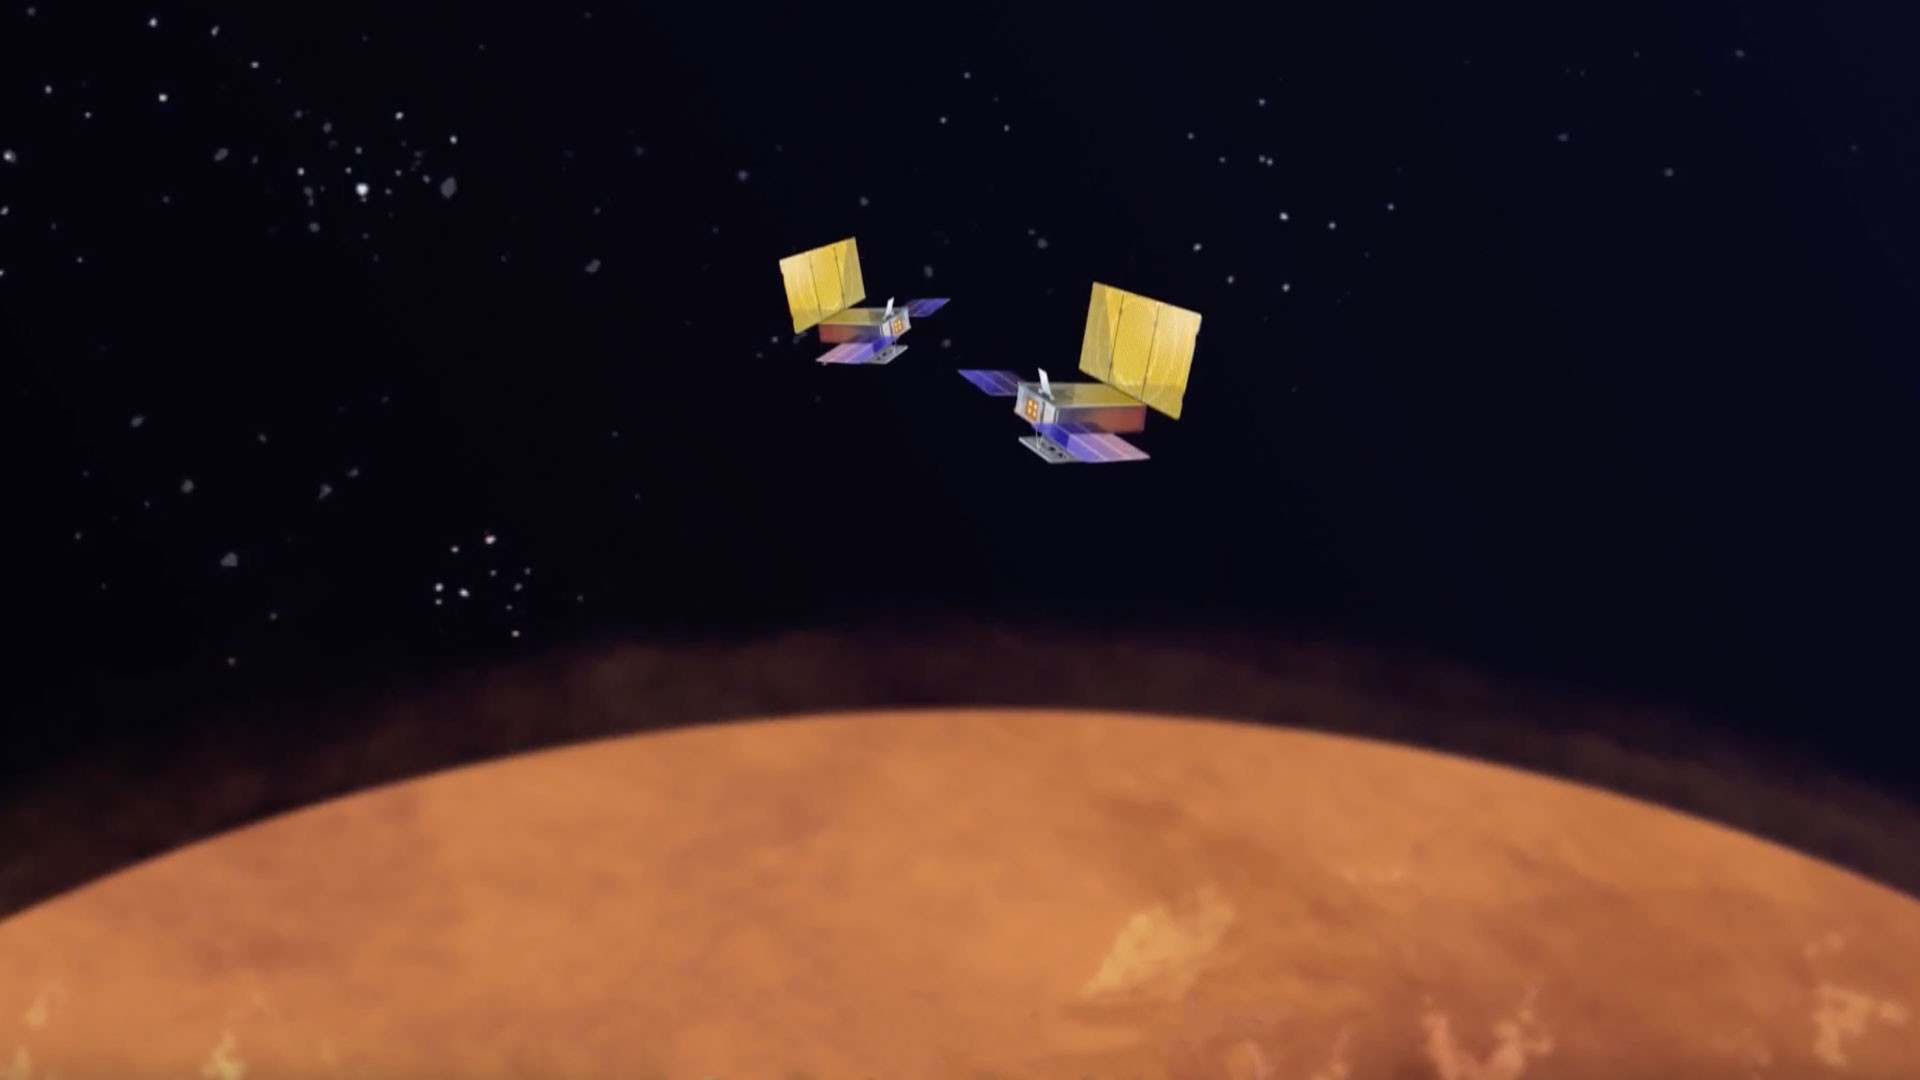 "<p>Скриншот видео:&nbsp;<a href=""https://www.youtube.com/watch?v=P_8ZEAPrrHQ"" target=""_blank"">youtube.com/NASA 360</a></p>"